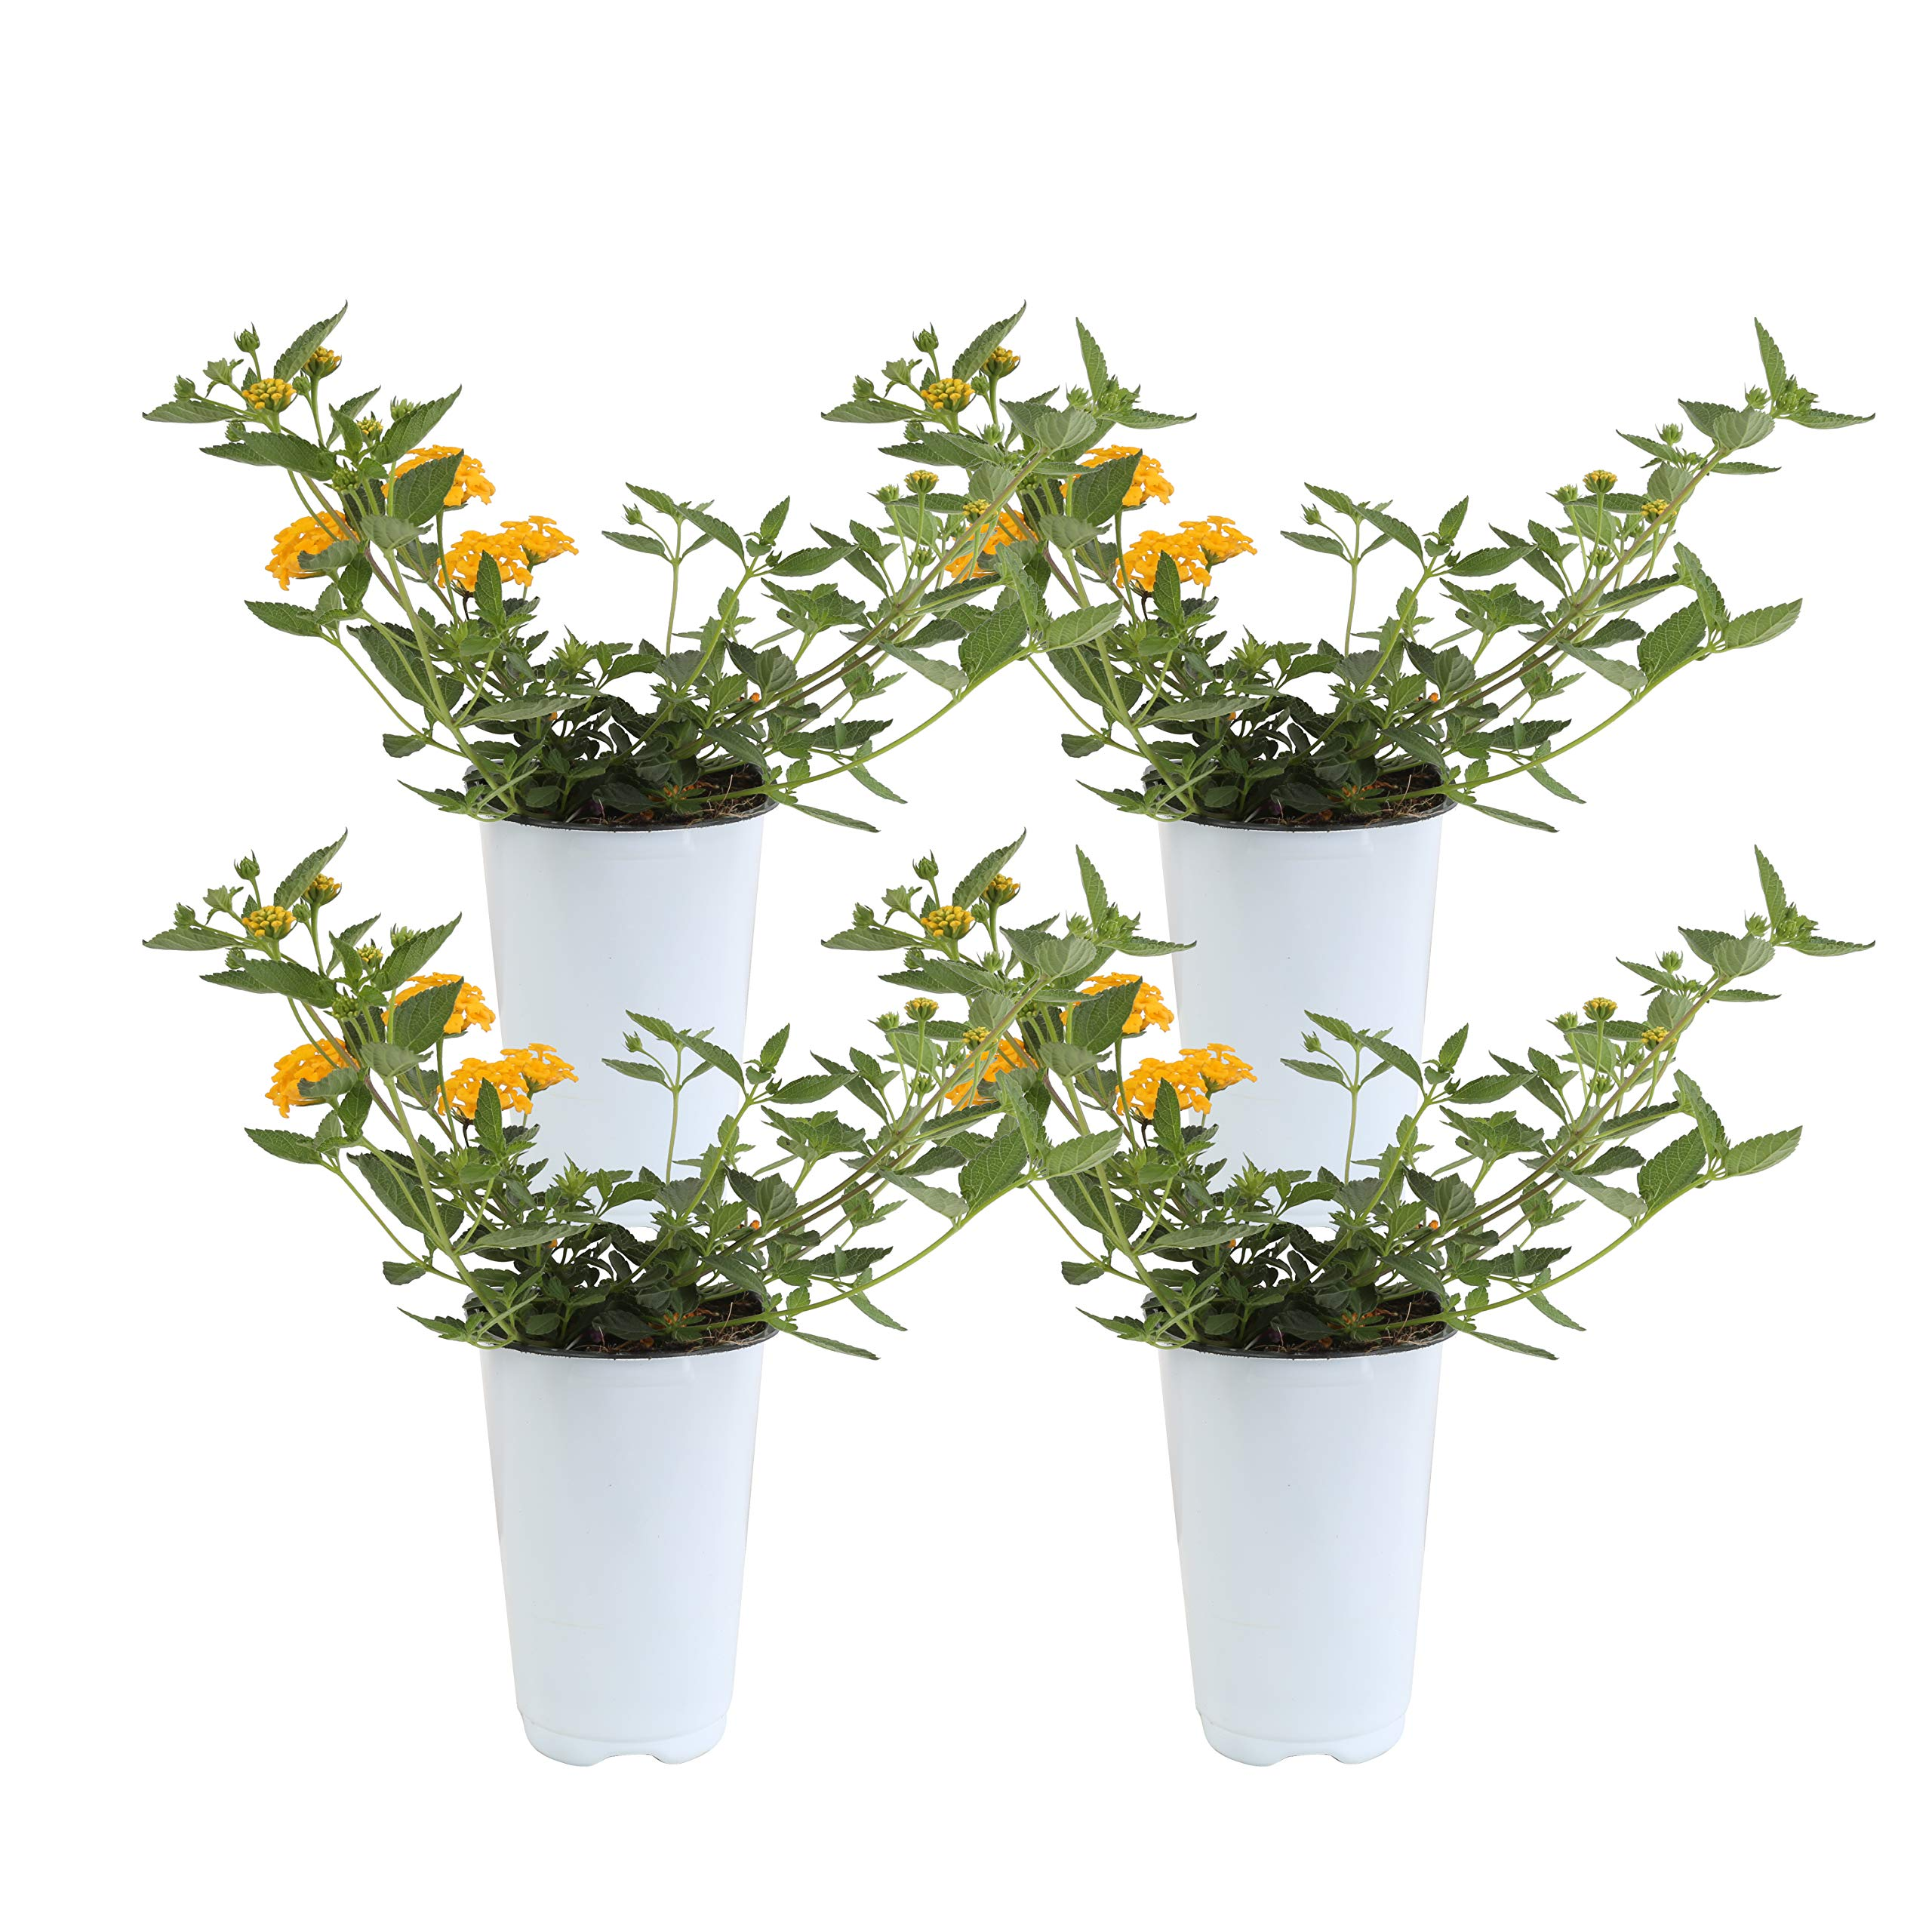 Costa Farms Live Premium Lantana Plant 1.00 qt Grower Pot, 4-Pack Yellow